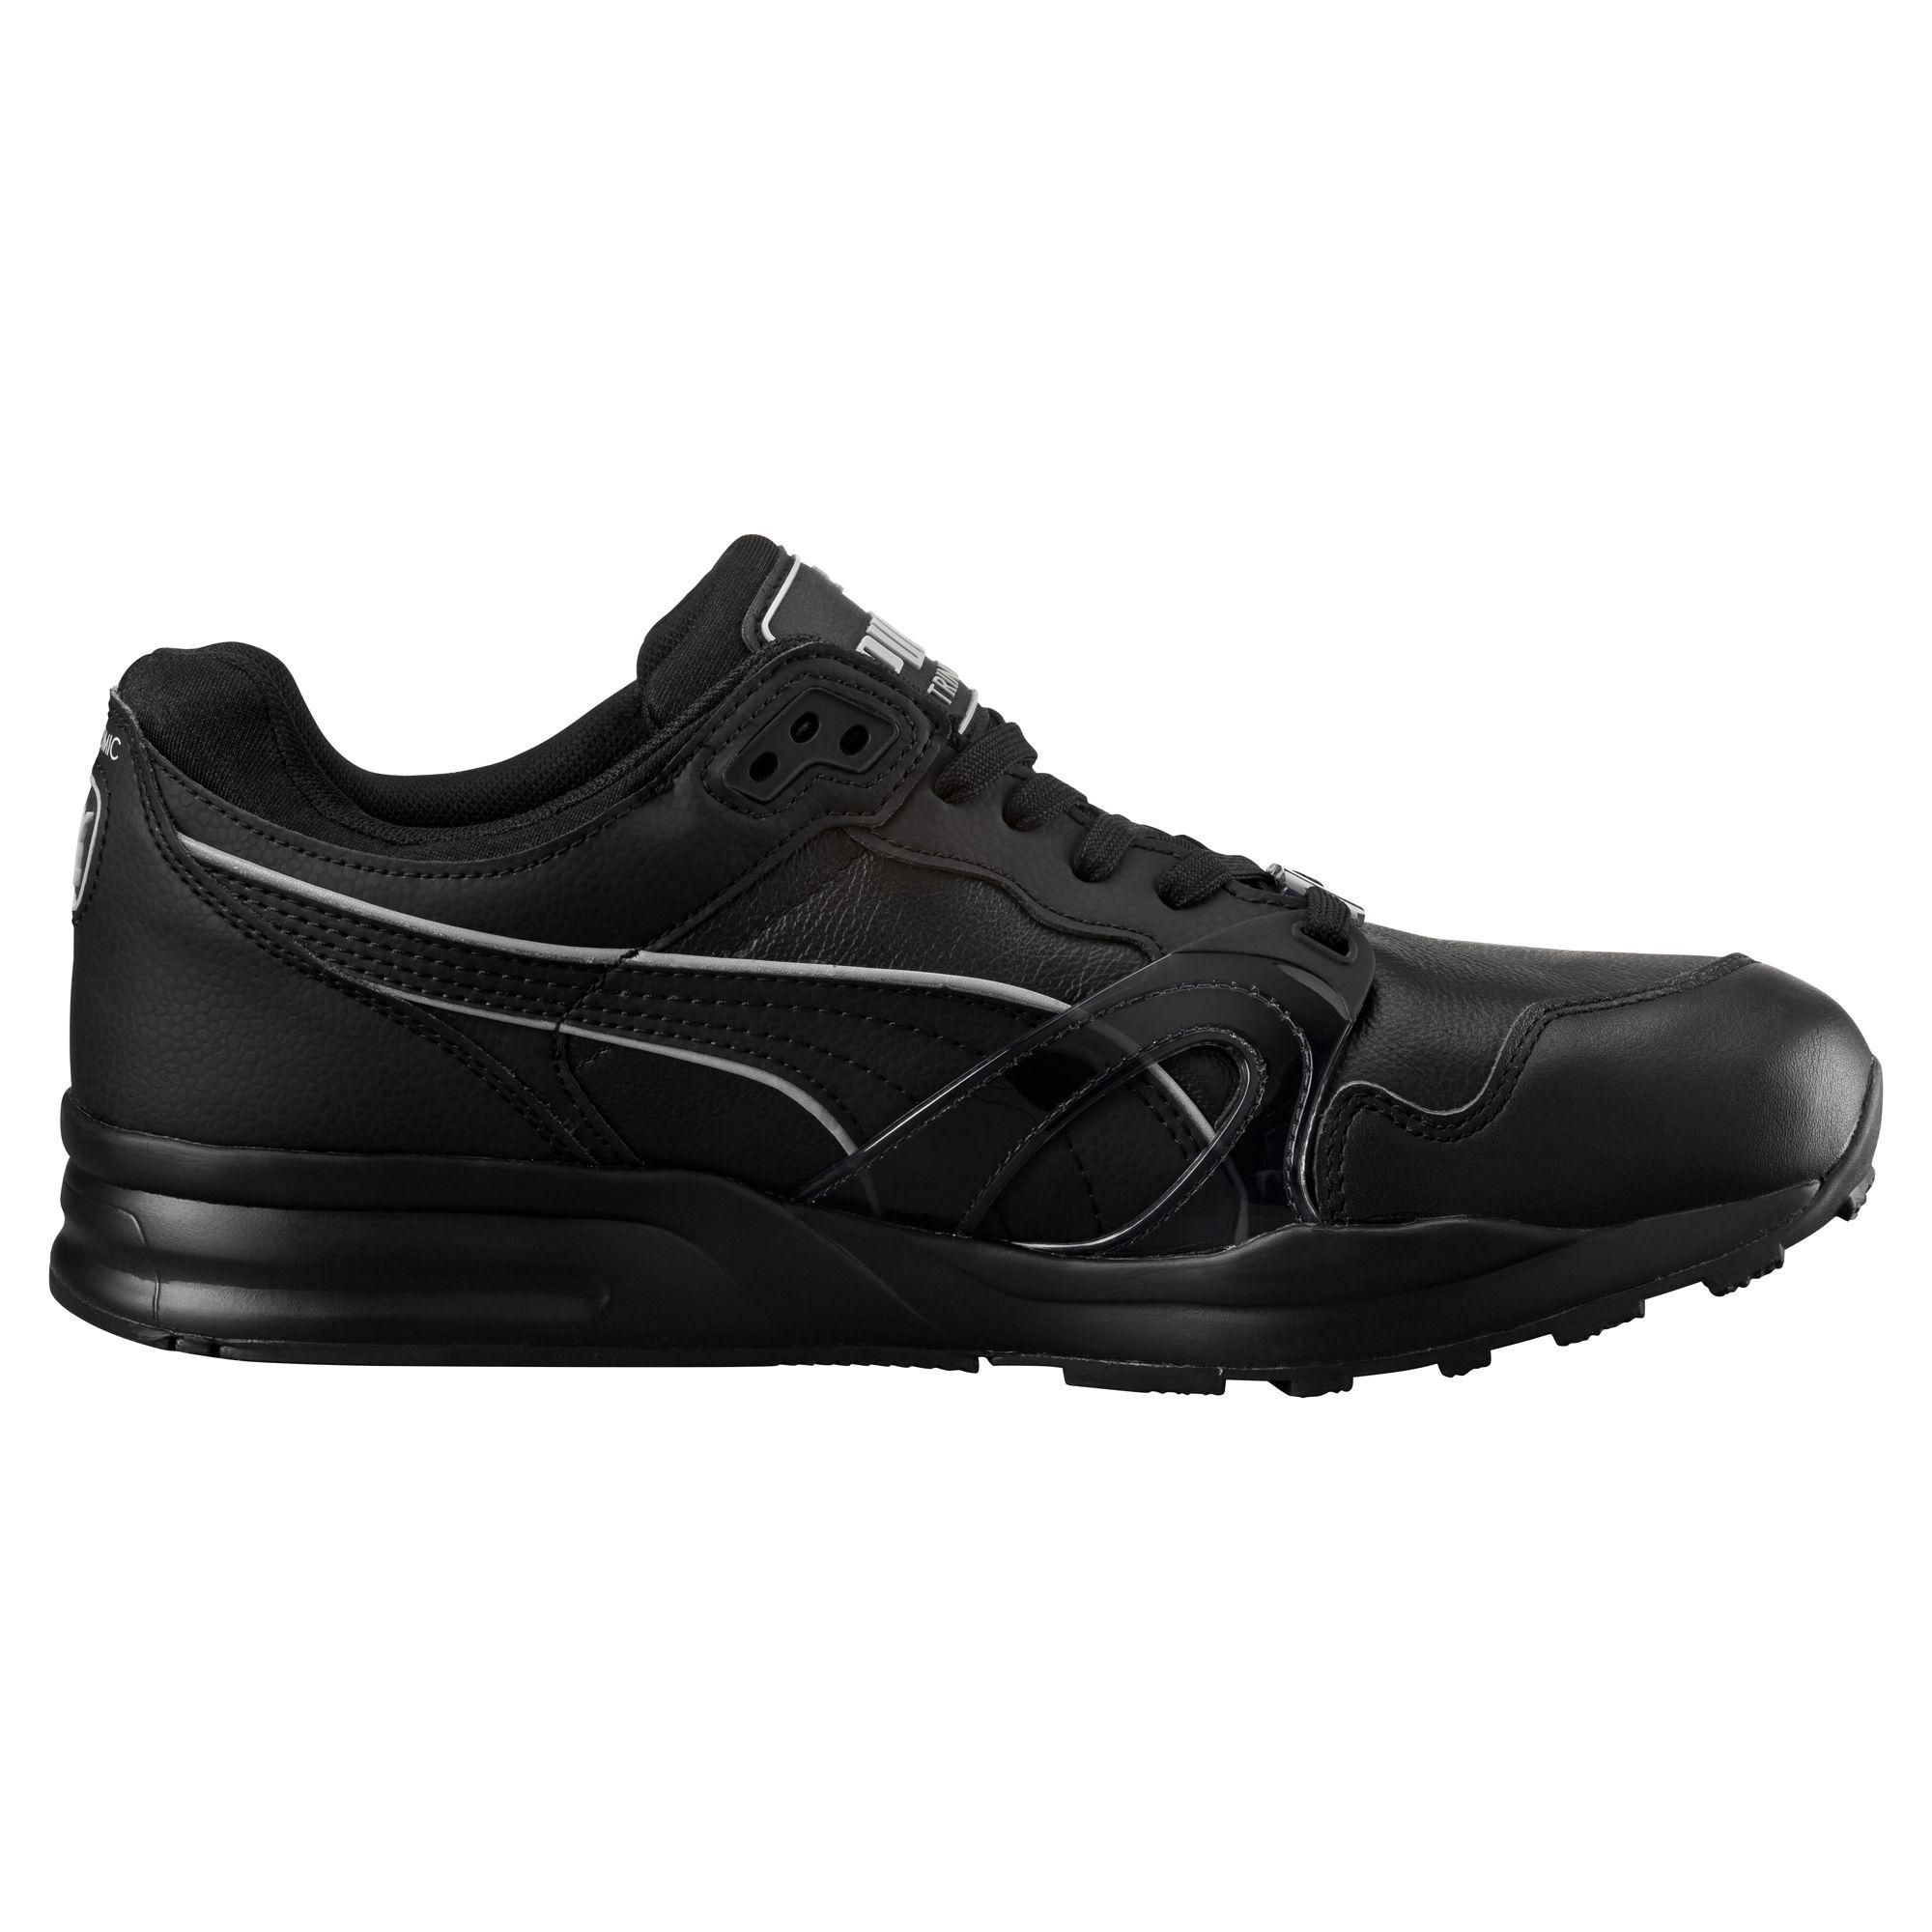 puma trinomic xt 1 reflectriple sneaker schuhe sneakers. Black Bedroom Furniture Sets. Home Design Ideas